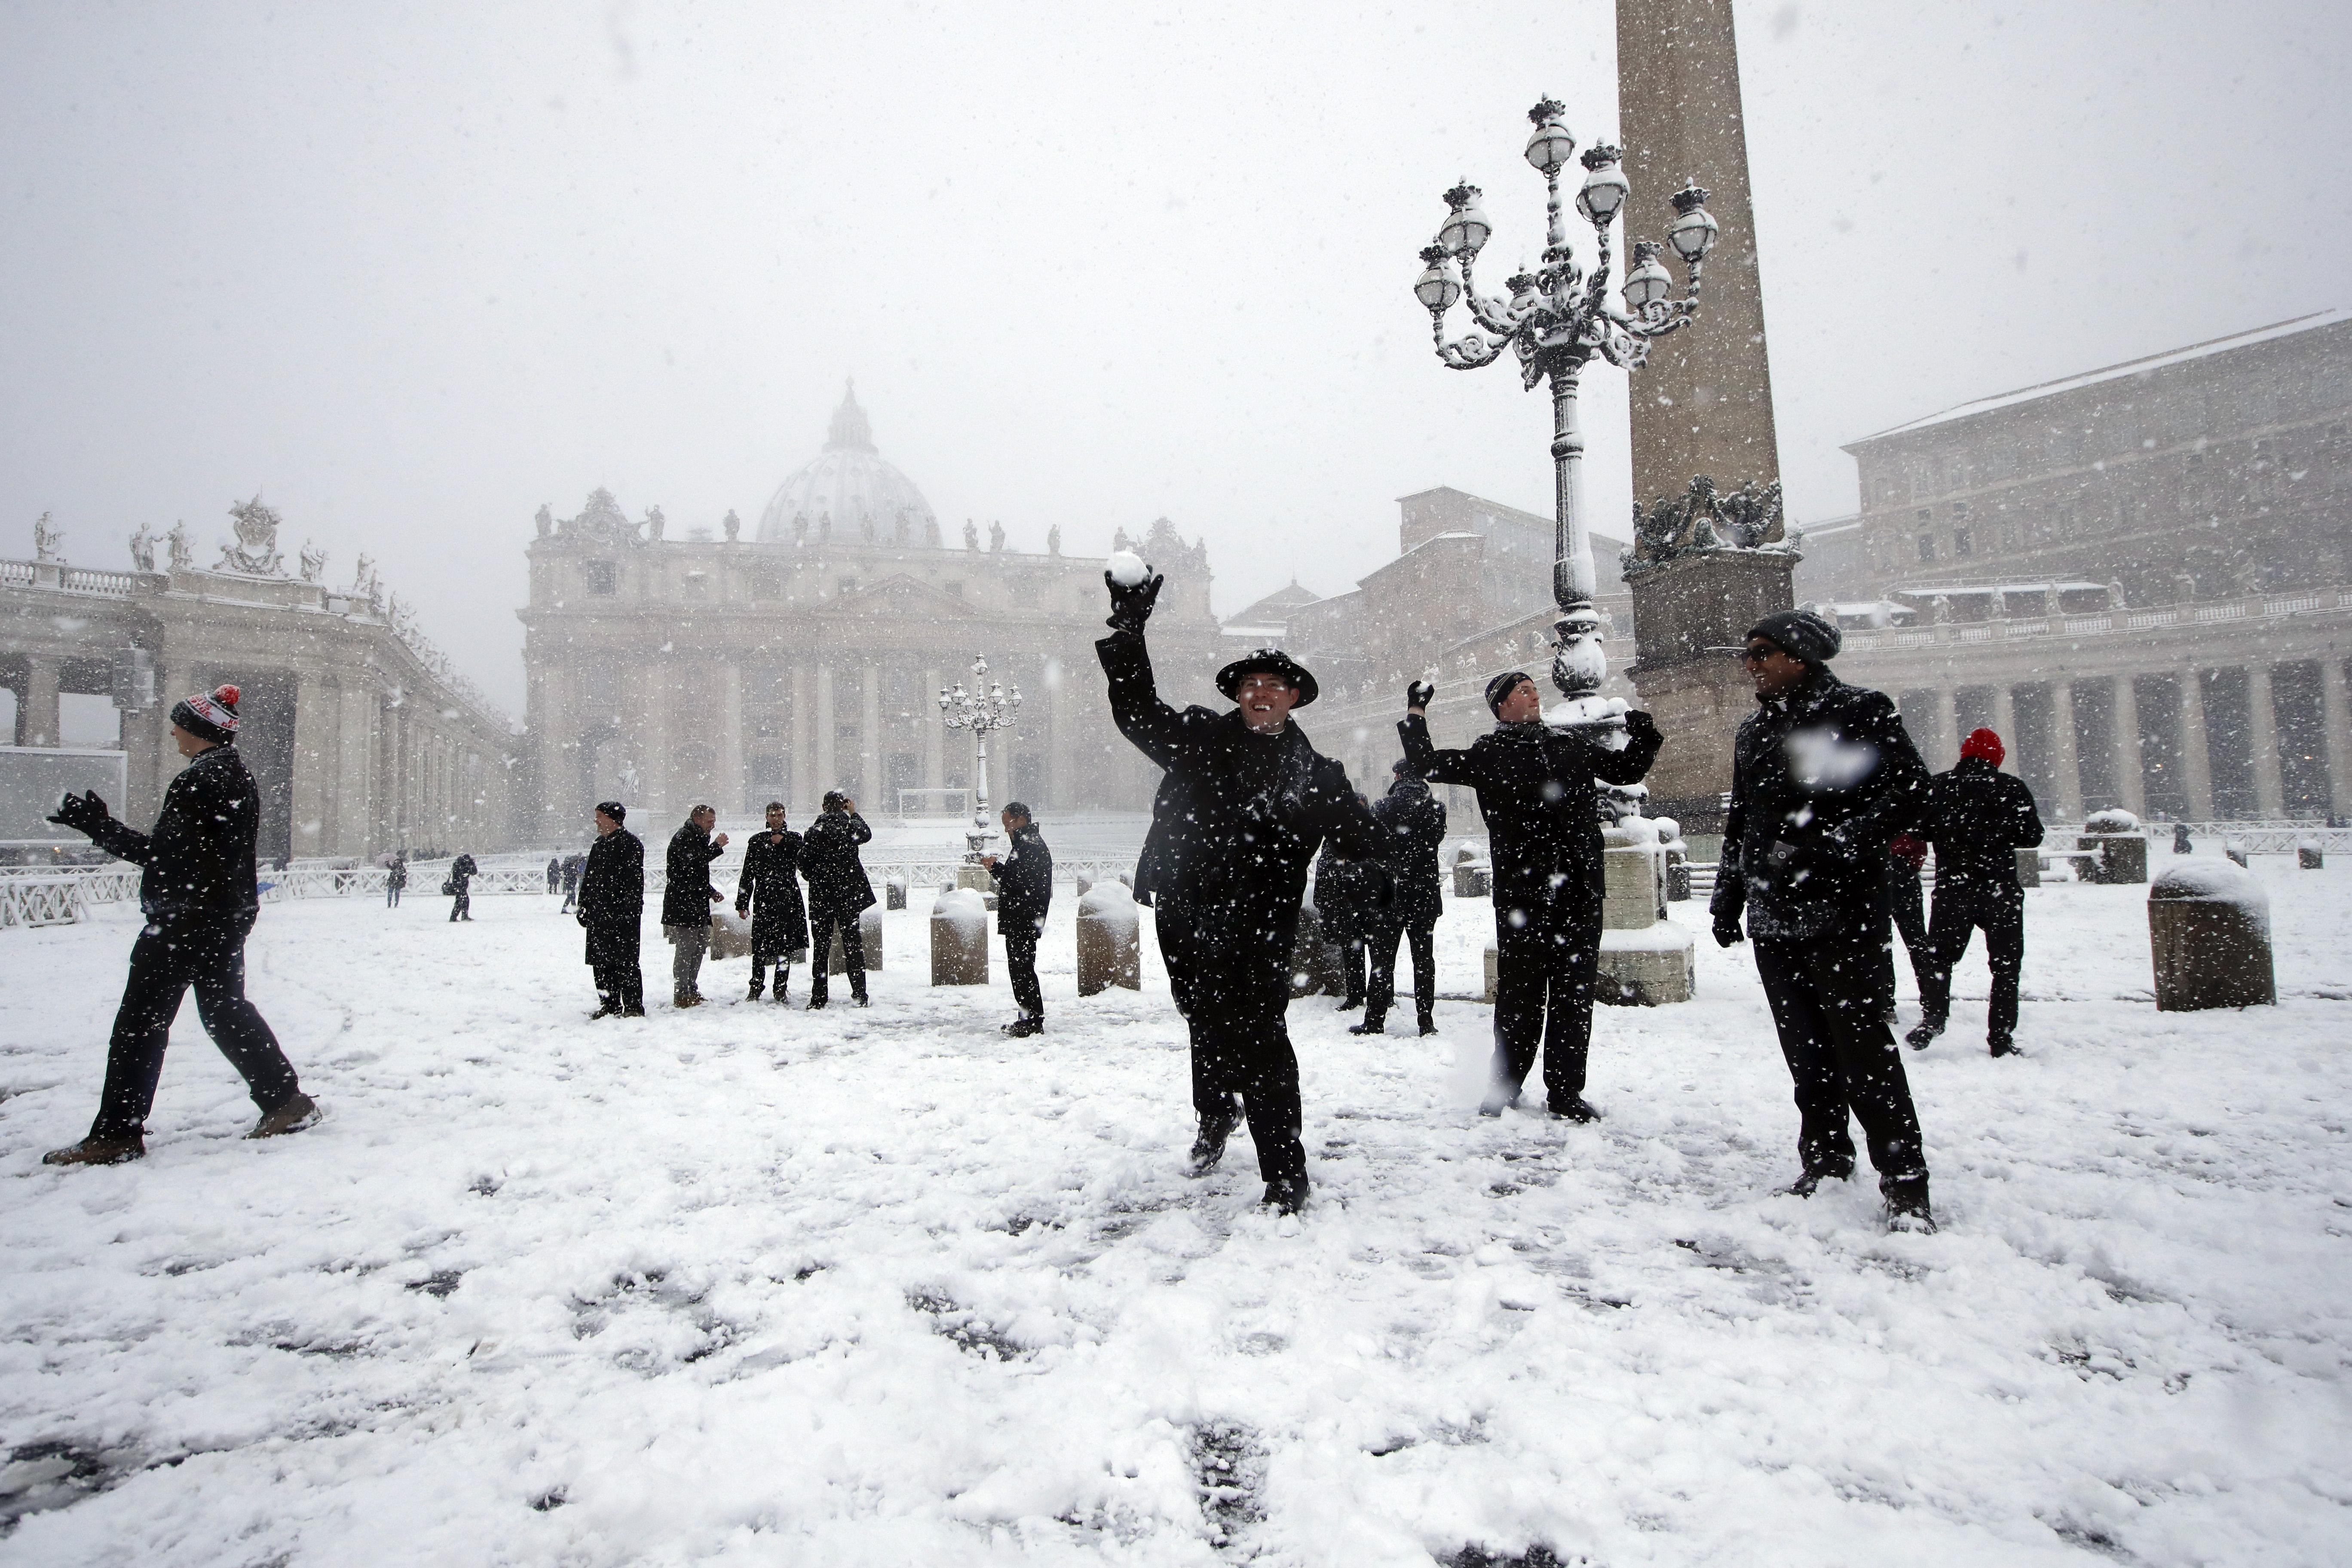 Guerra de bolas de nieve en la Plaza San Pedro. (AP/Alessandra Tarantino)